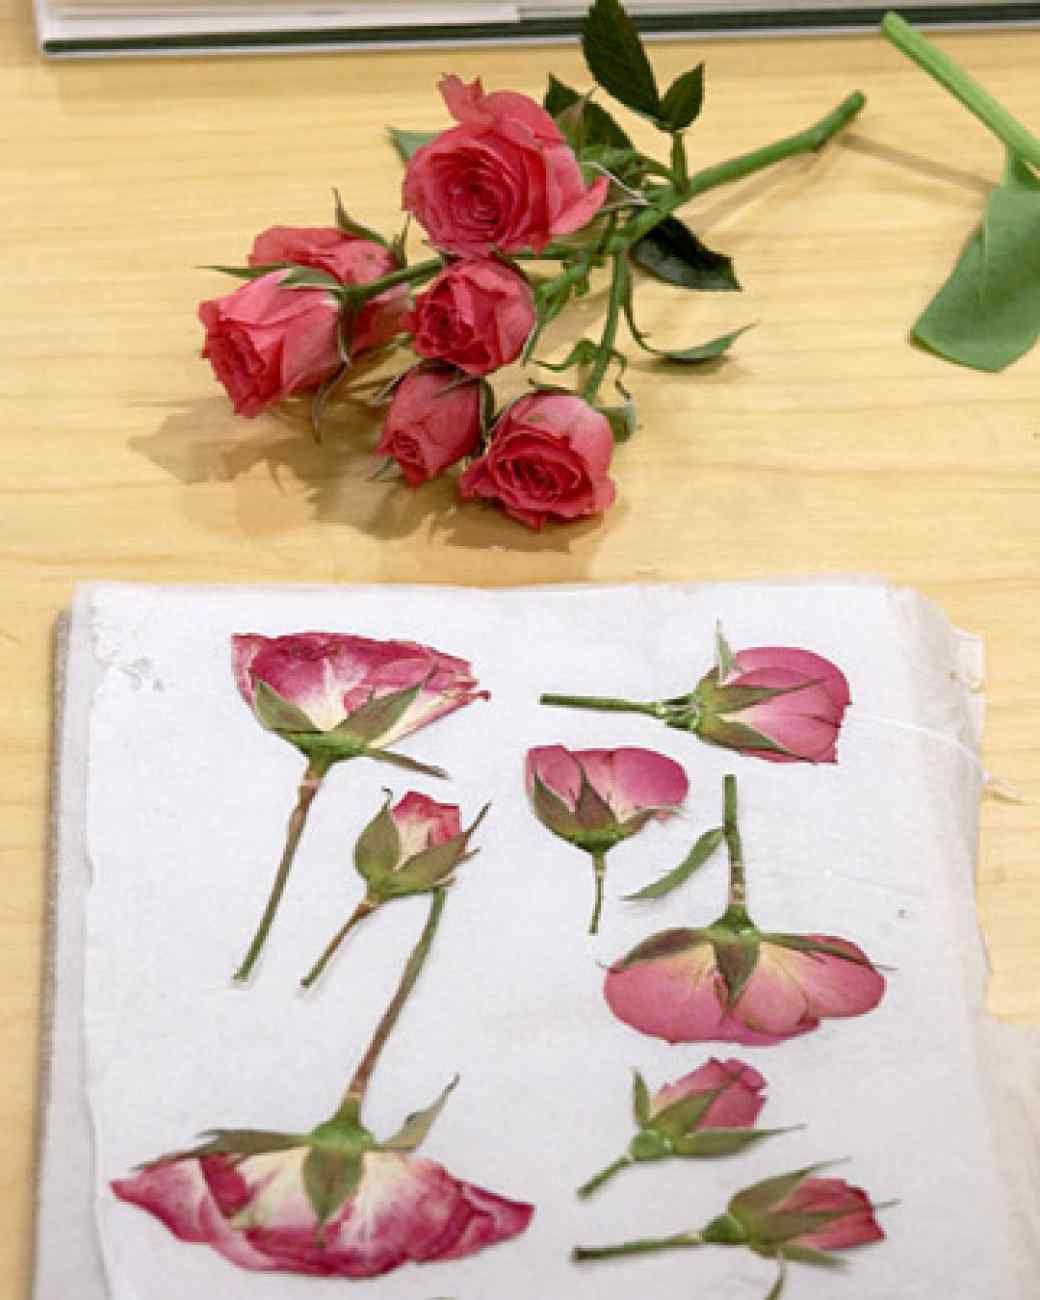 Uncategorized How To Make Pressed Flowers pressing flowers with janie flower and tutorials janie